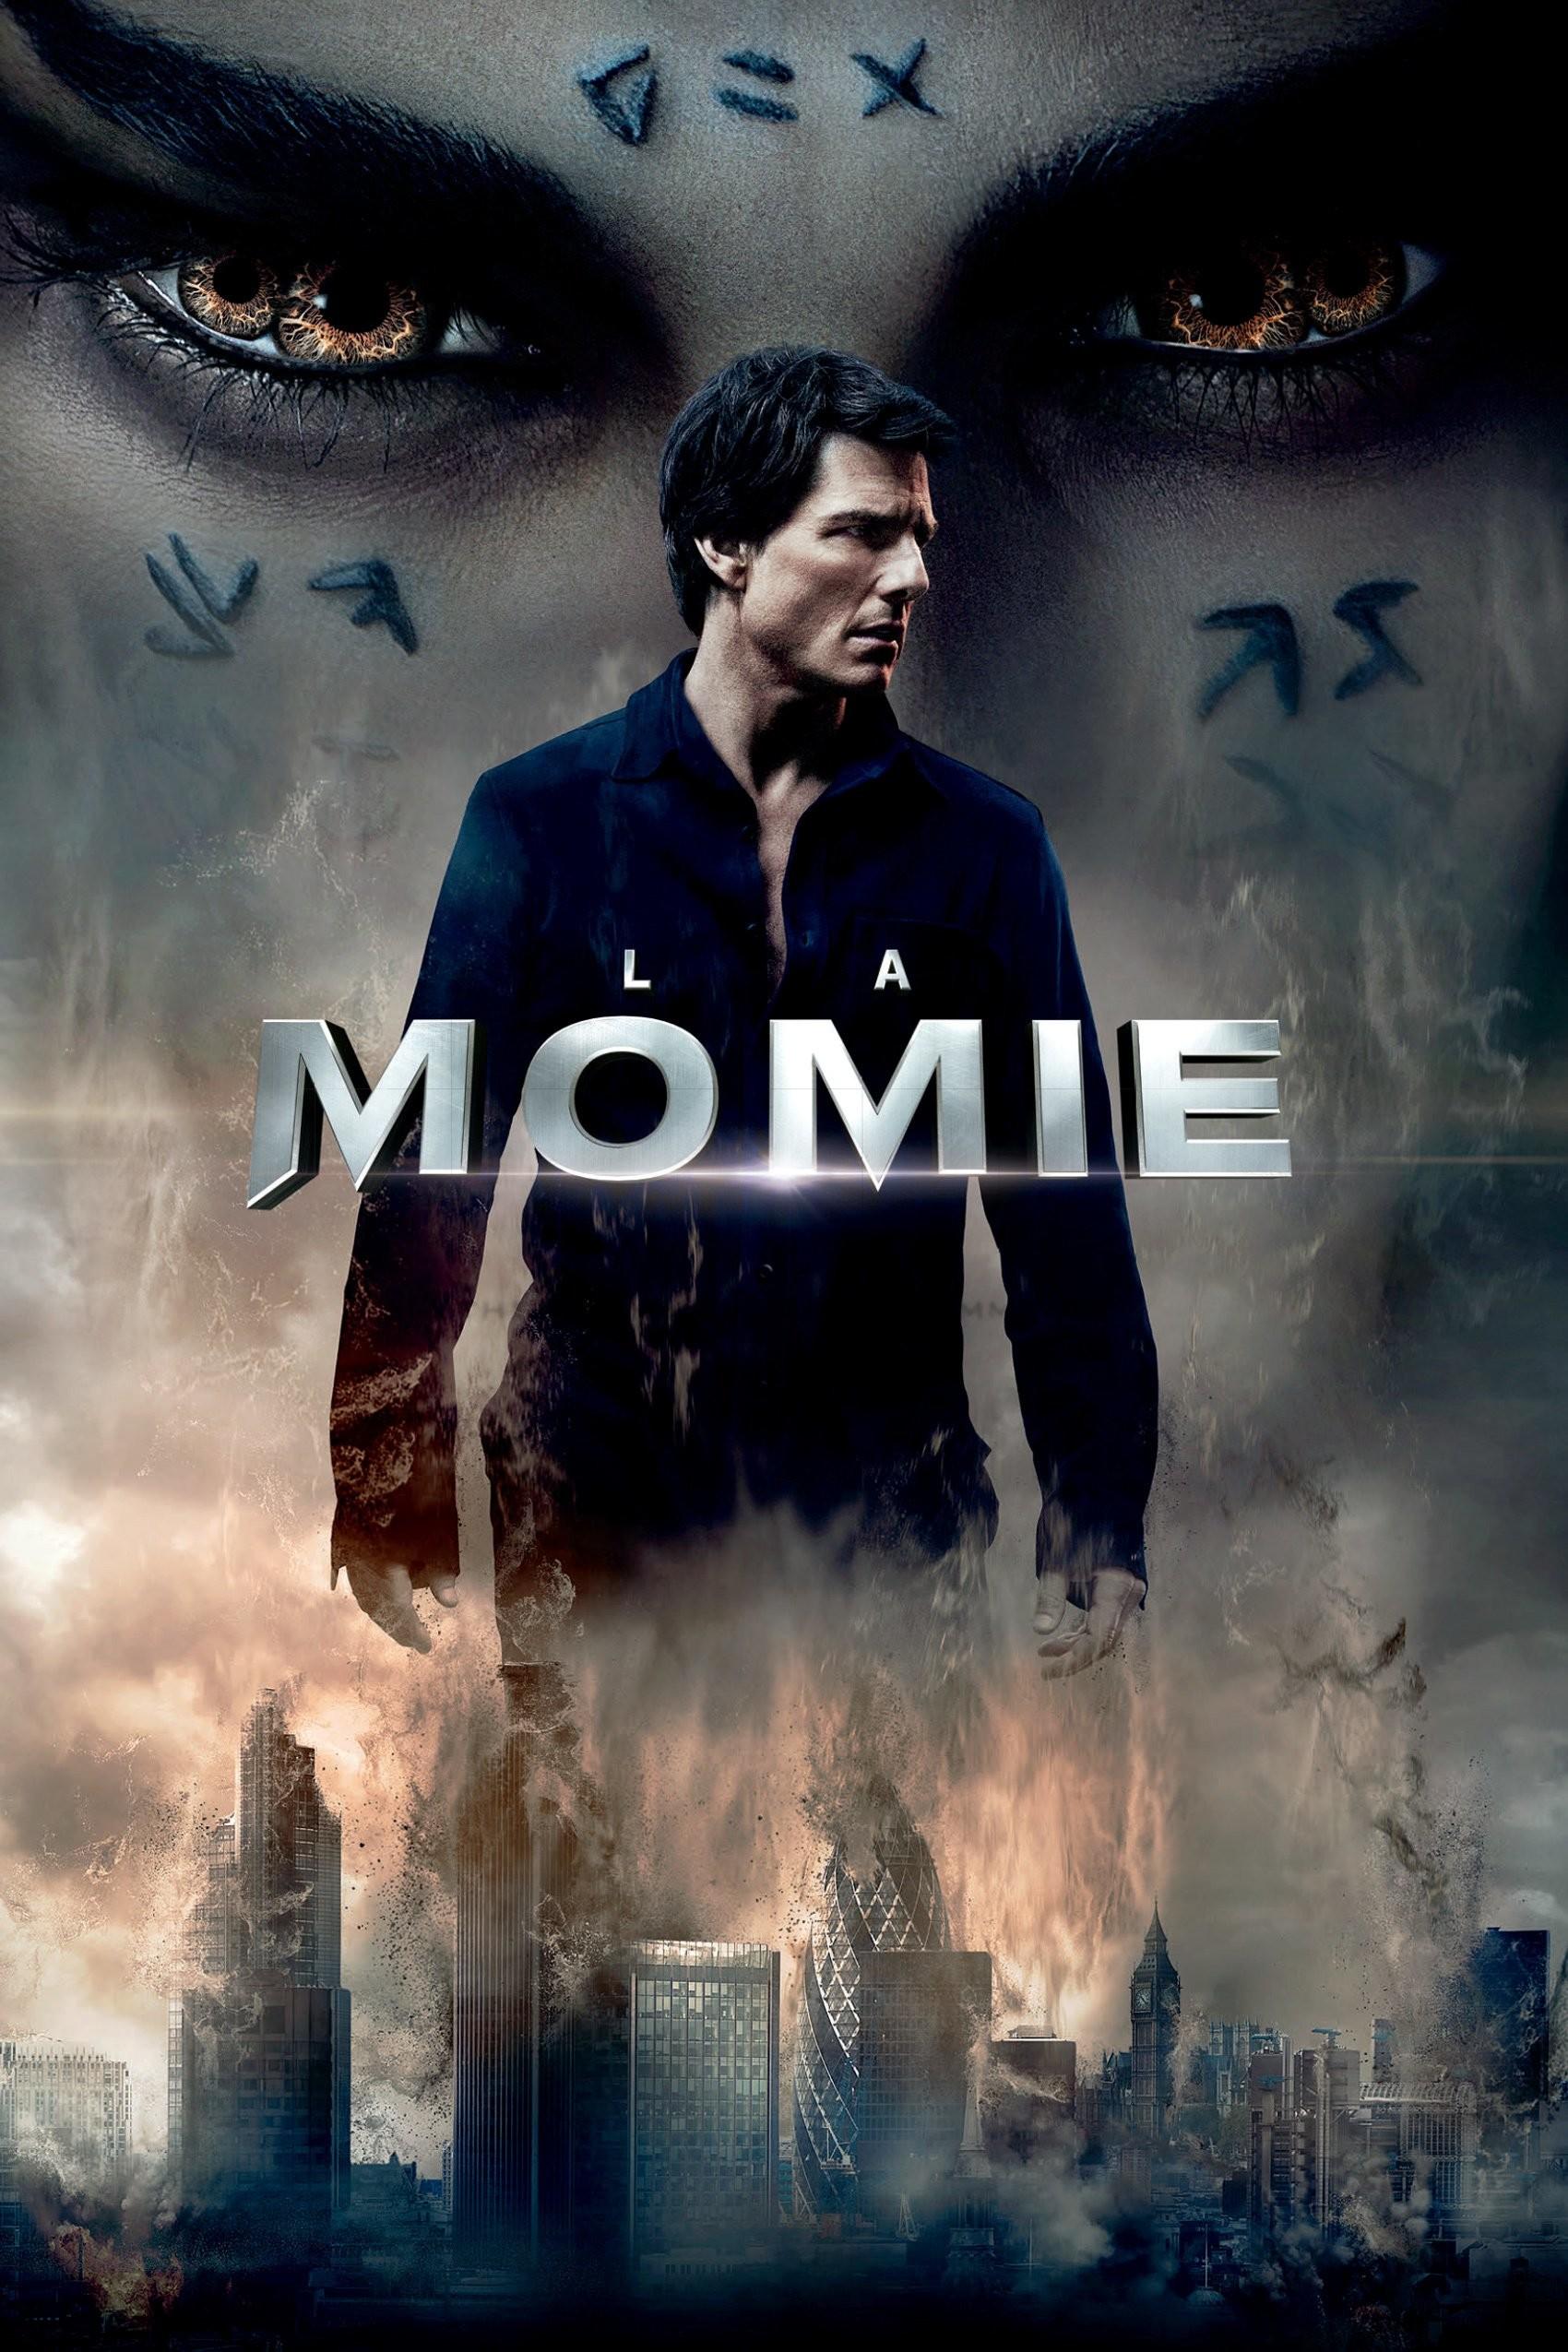 Regarder La Momie (2017) Gratuit en Ligne